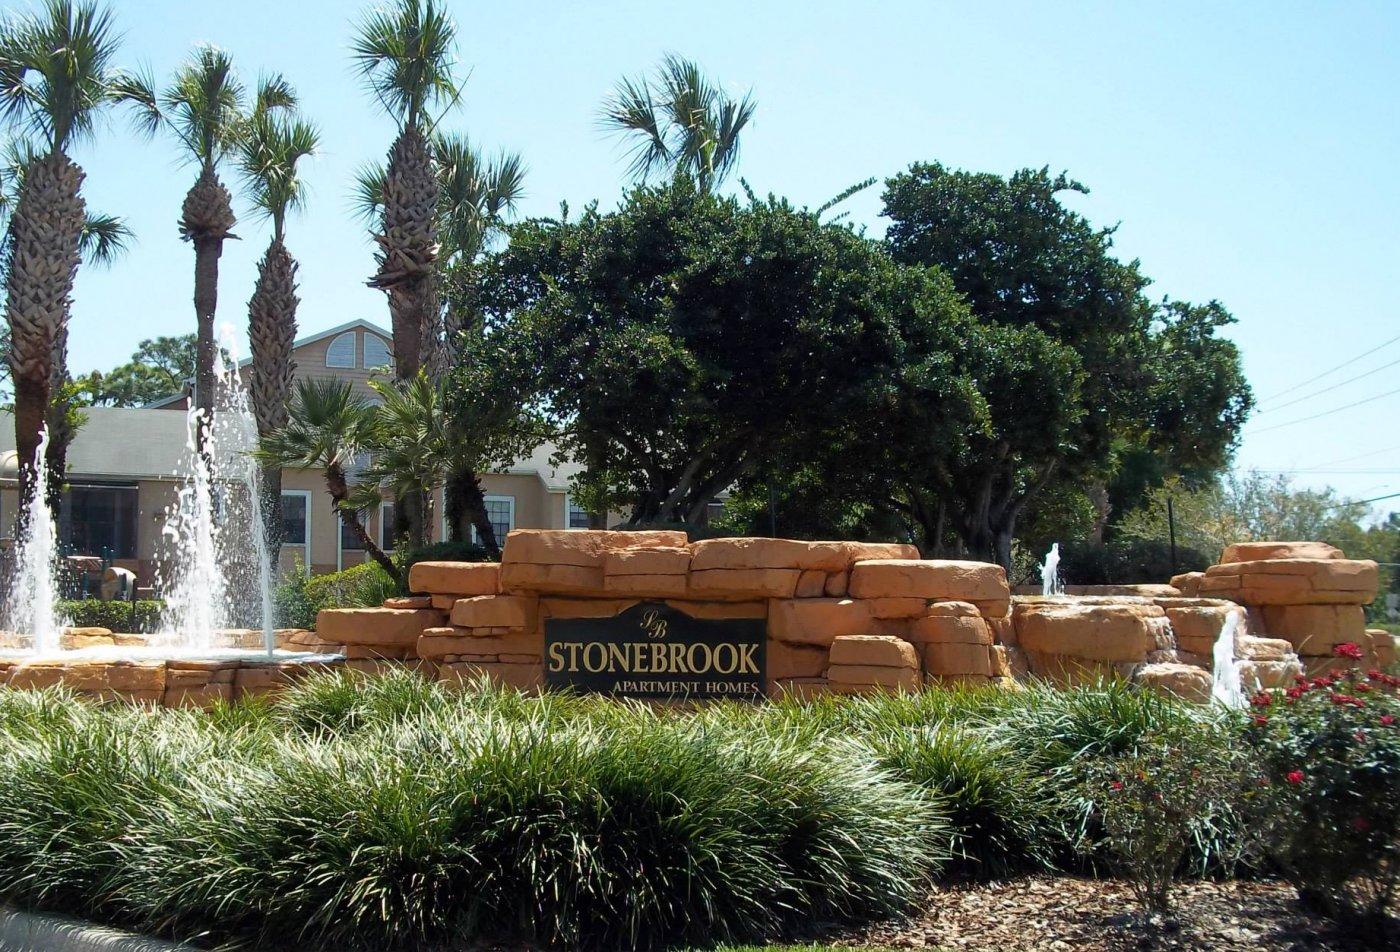 Stonebrook